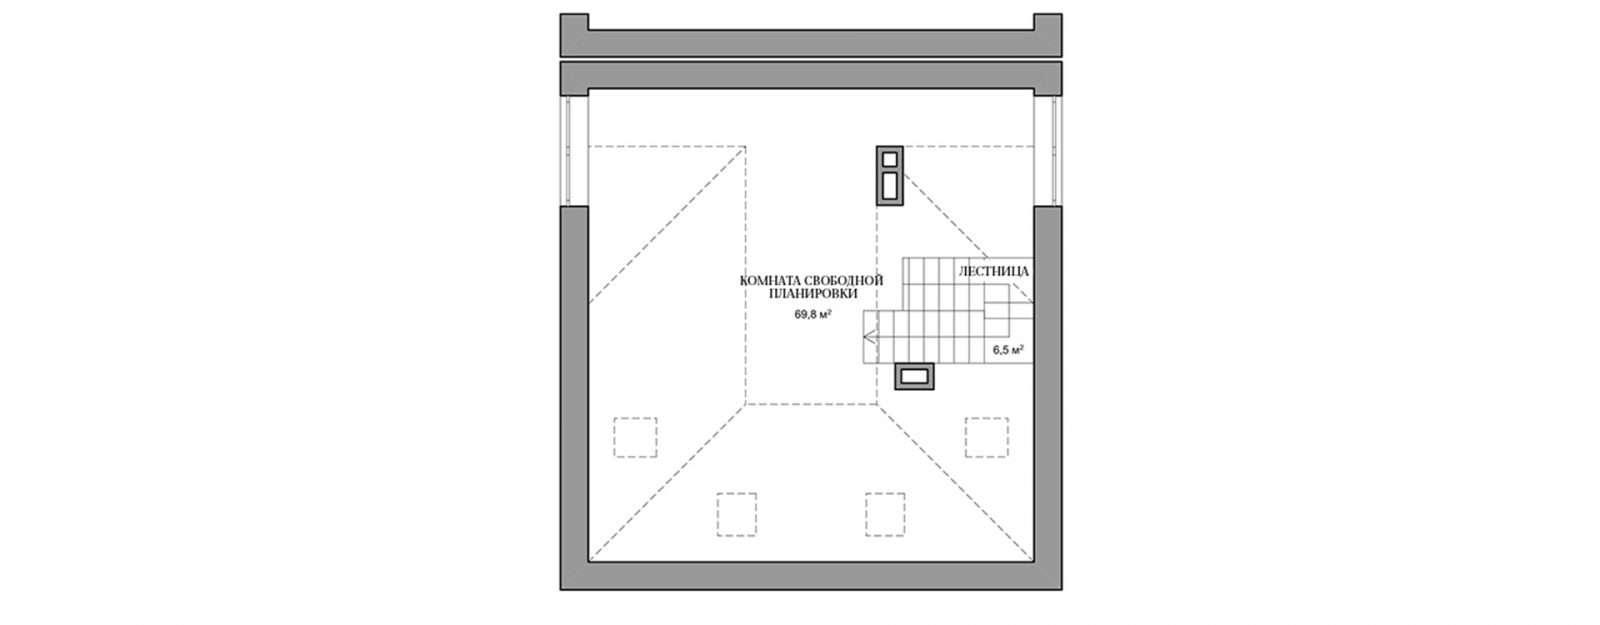 Дуплекс «Глория» - план мансарды